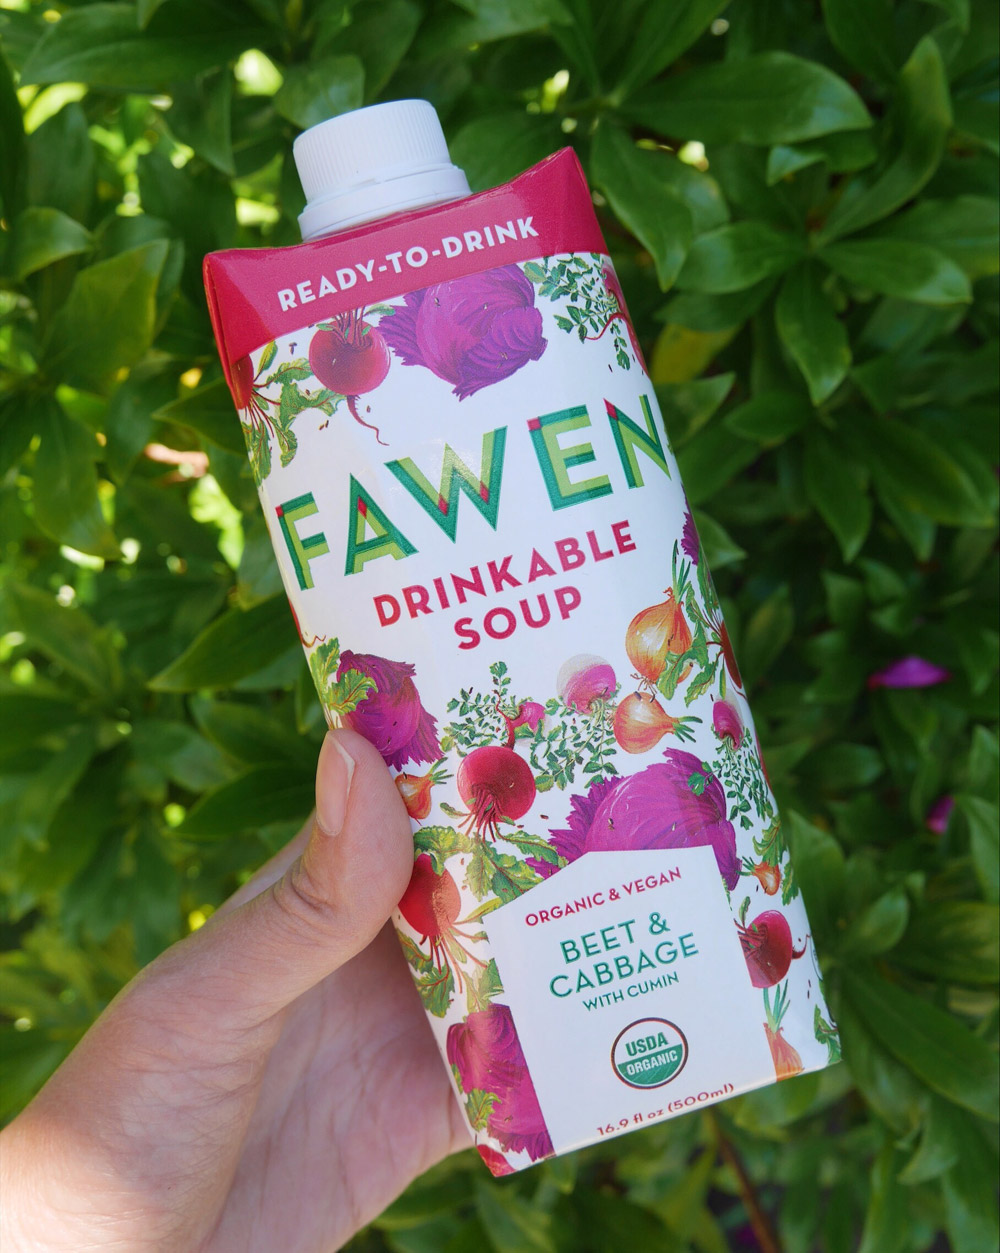 Fawen Organic Vegan Soup, Beet & Cabbage Soup